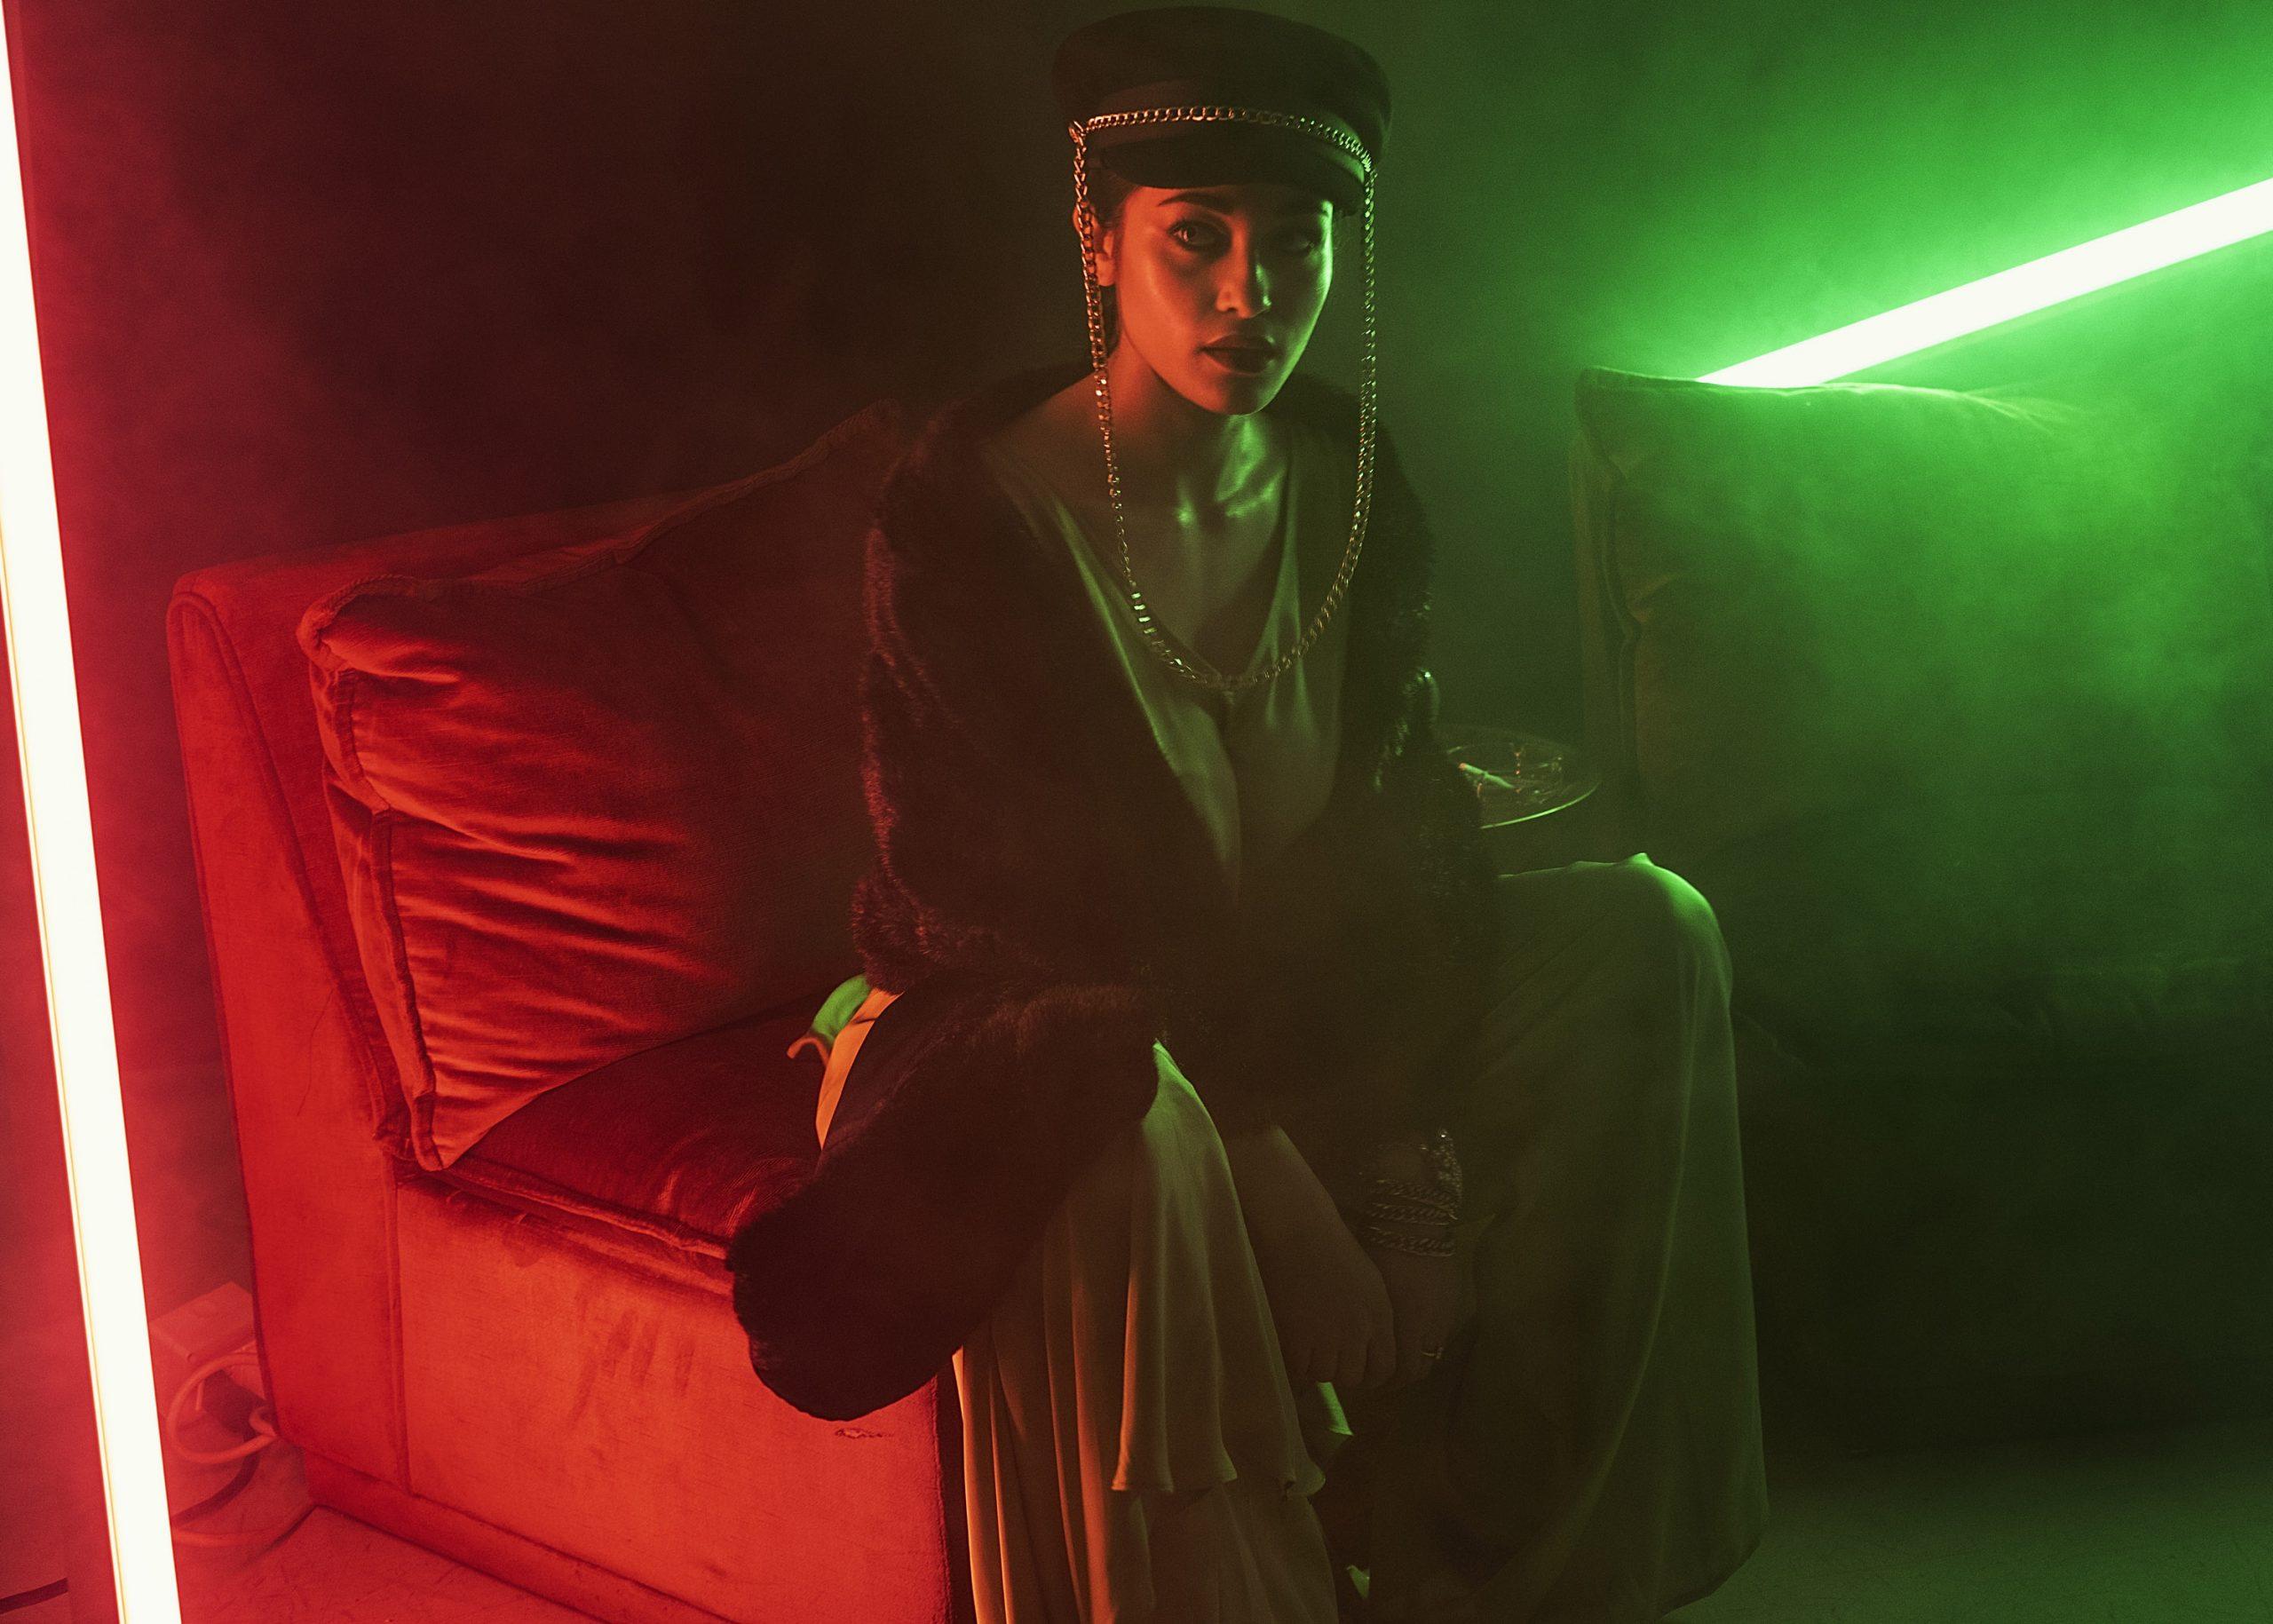 Categorie: Fashion, Glamour, Portrait - Photographer: YLENIA NESE; Stylist: THOMAS DILILLO - Model: MARGHERITA ARESTI - Mua: ALESSANDRA RIGHI - Location: Roma, RM, Italia